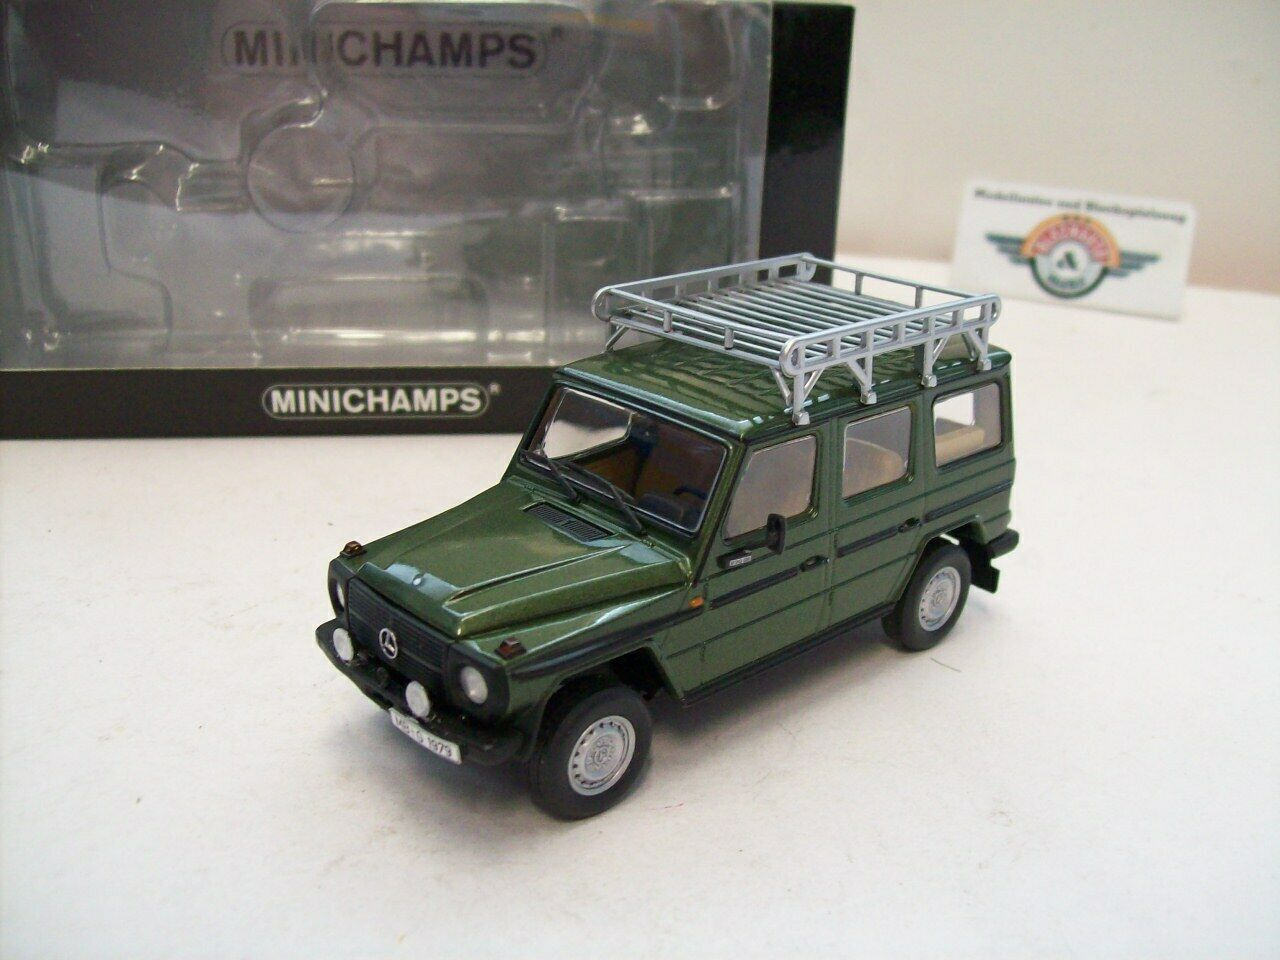 MERCEDES-BENZ 230 GE (w460), 1980, vert Metallic Minichamps, 1 43, NEUF dans sa boîte